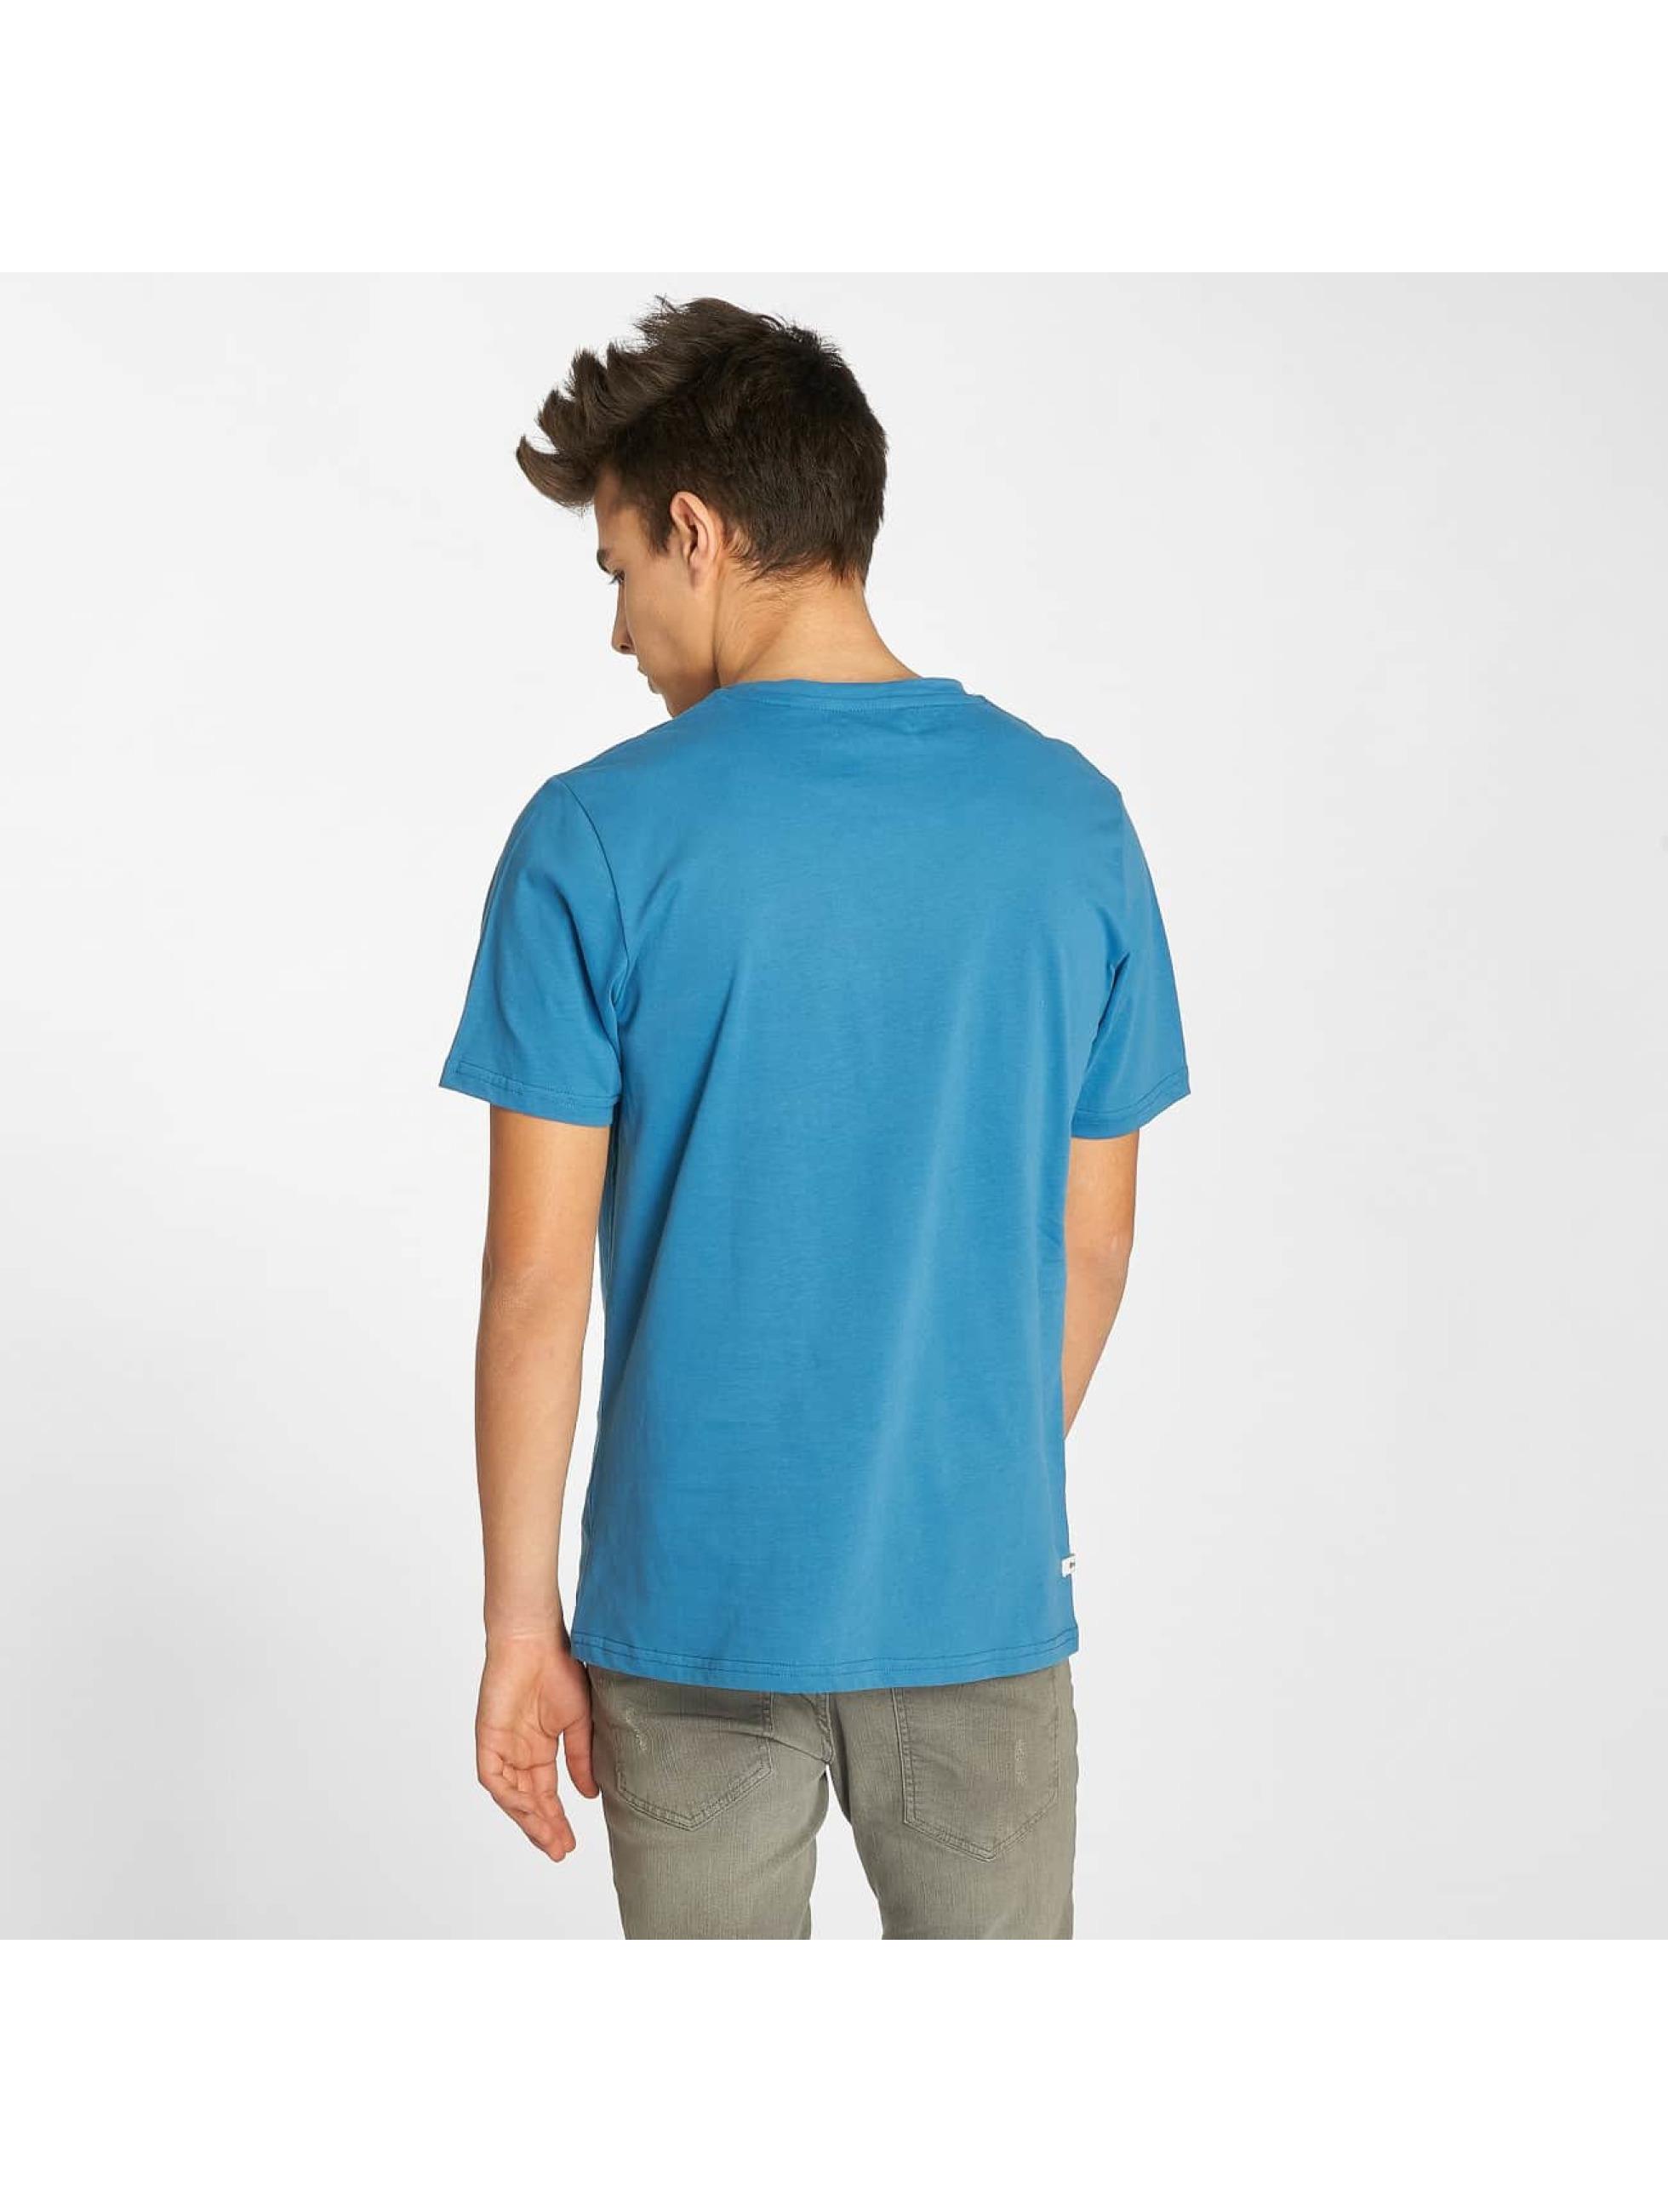 Kulte Camiseta Corpo College azul